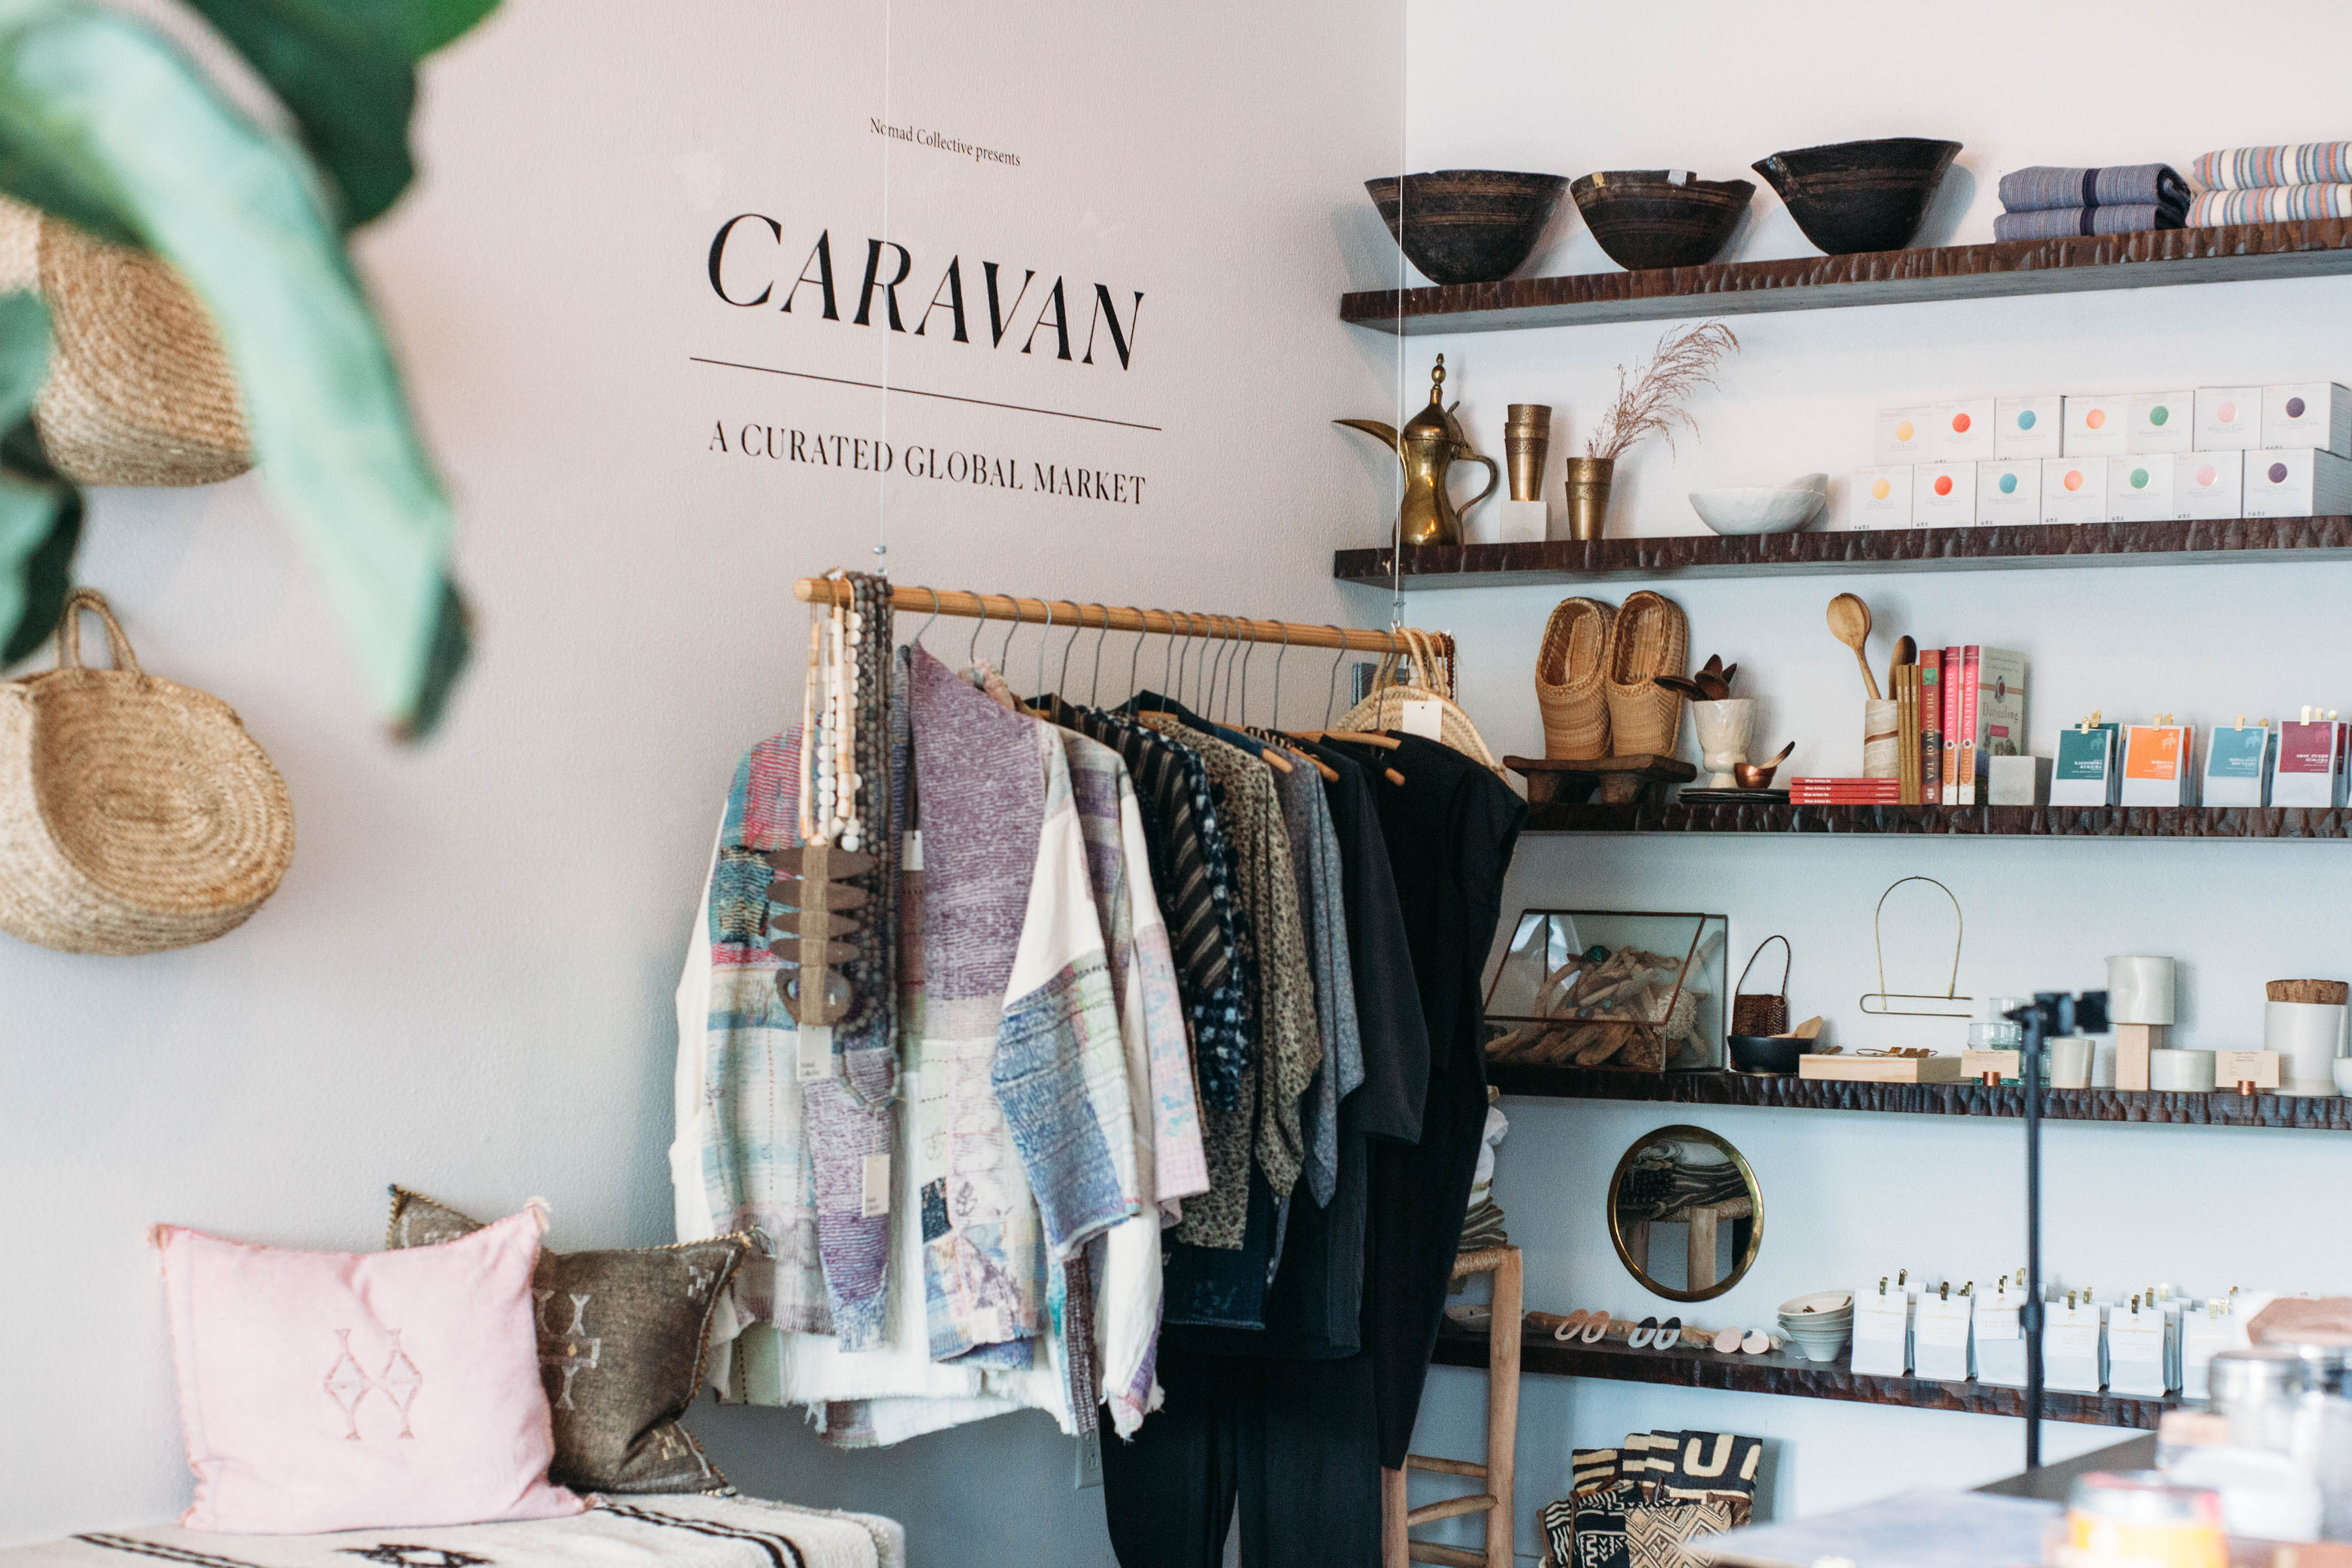 Caravan-curated-global-market